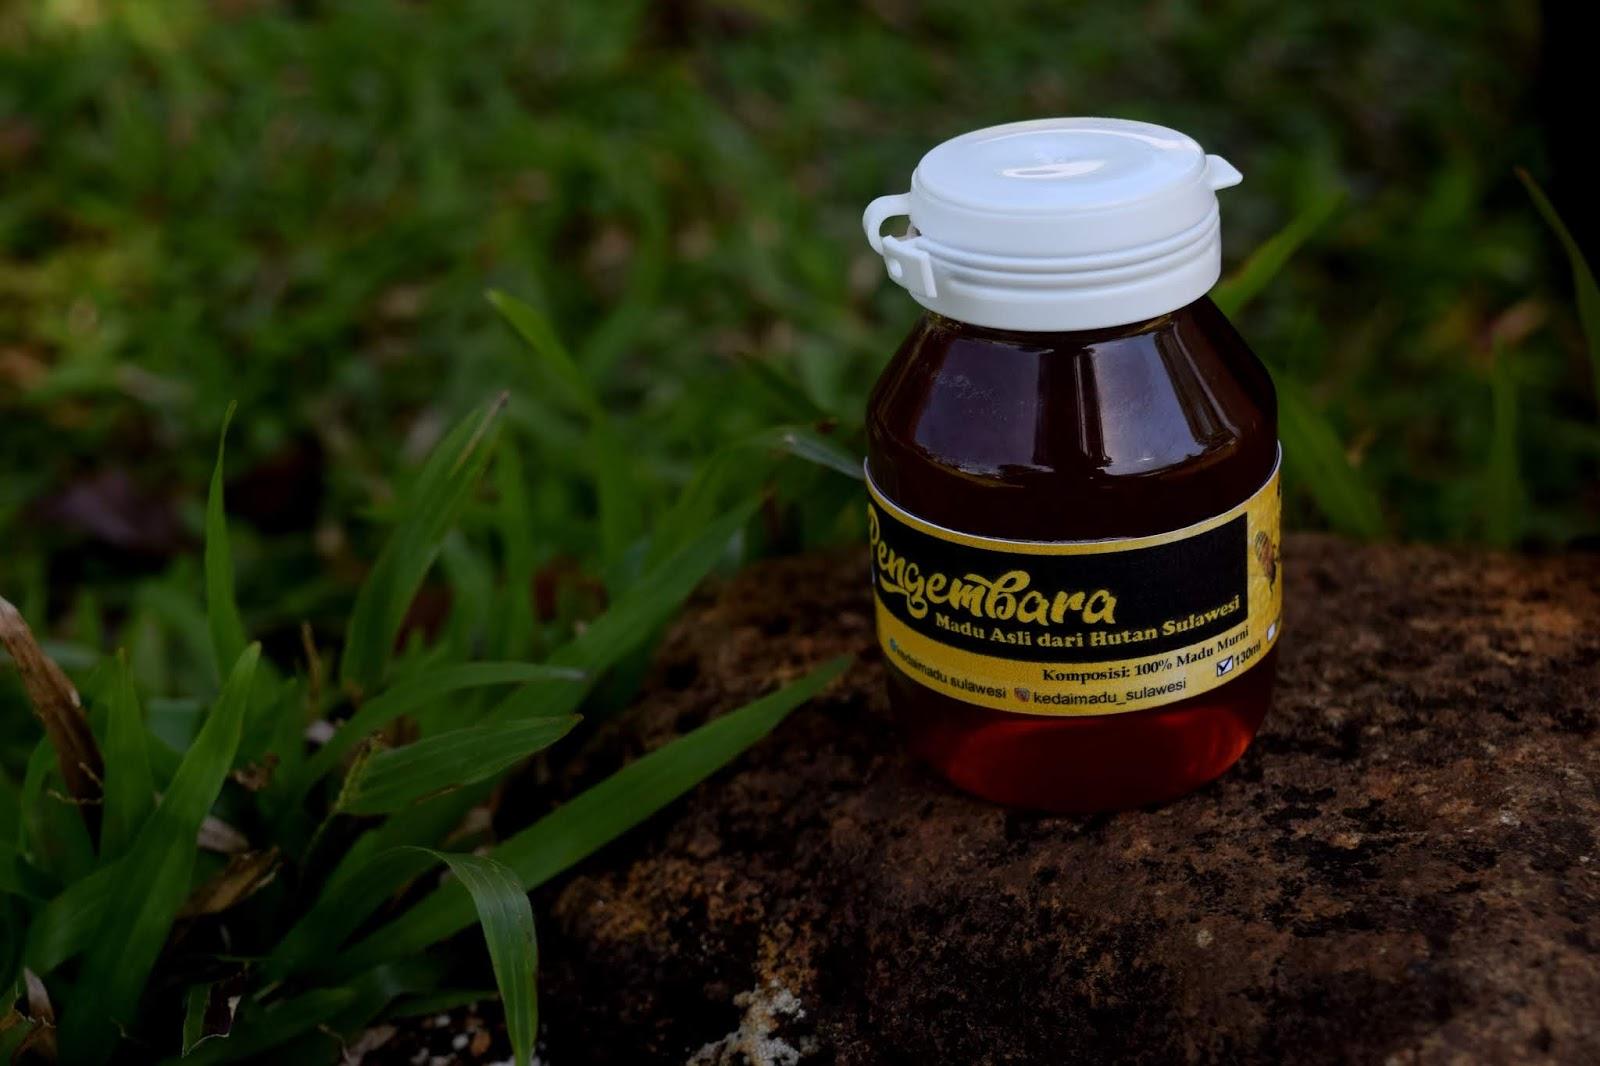 Madu coklat 130 ml - Kedai Madu Sulawesi